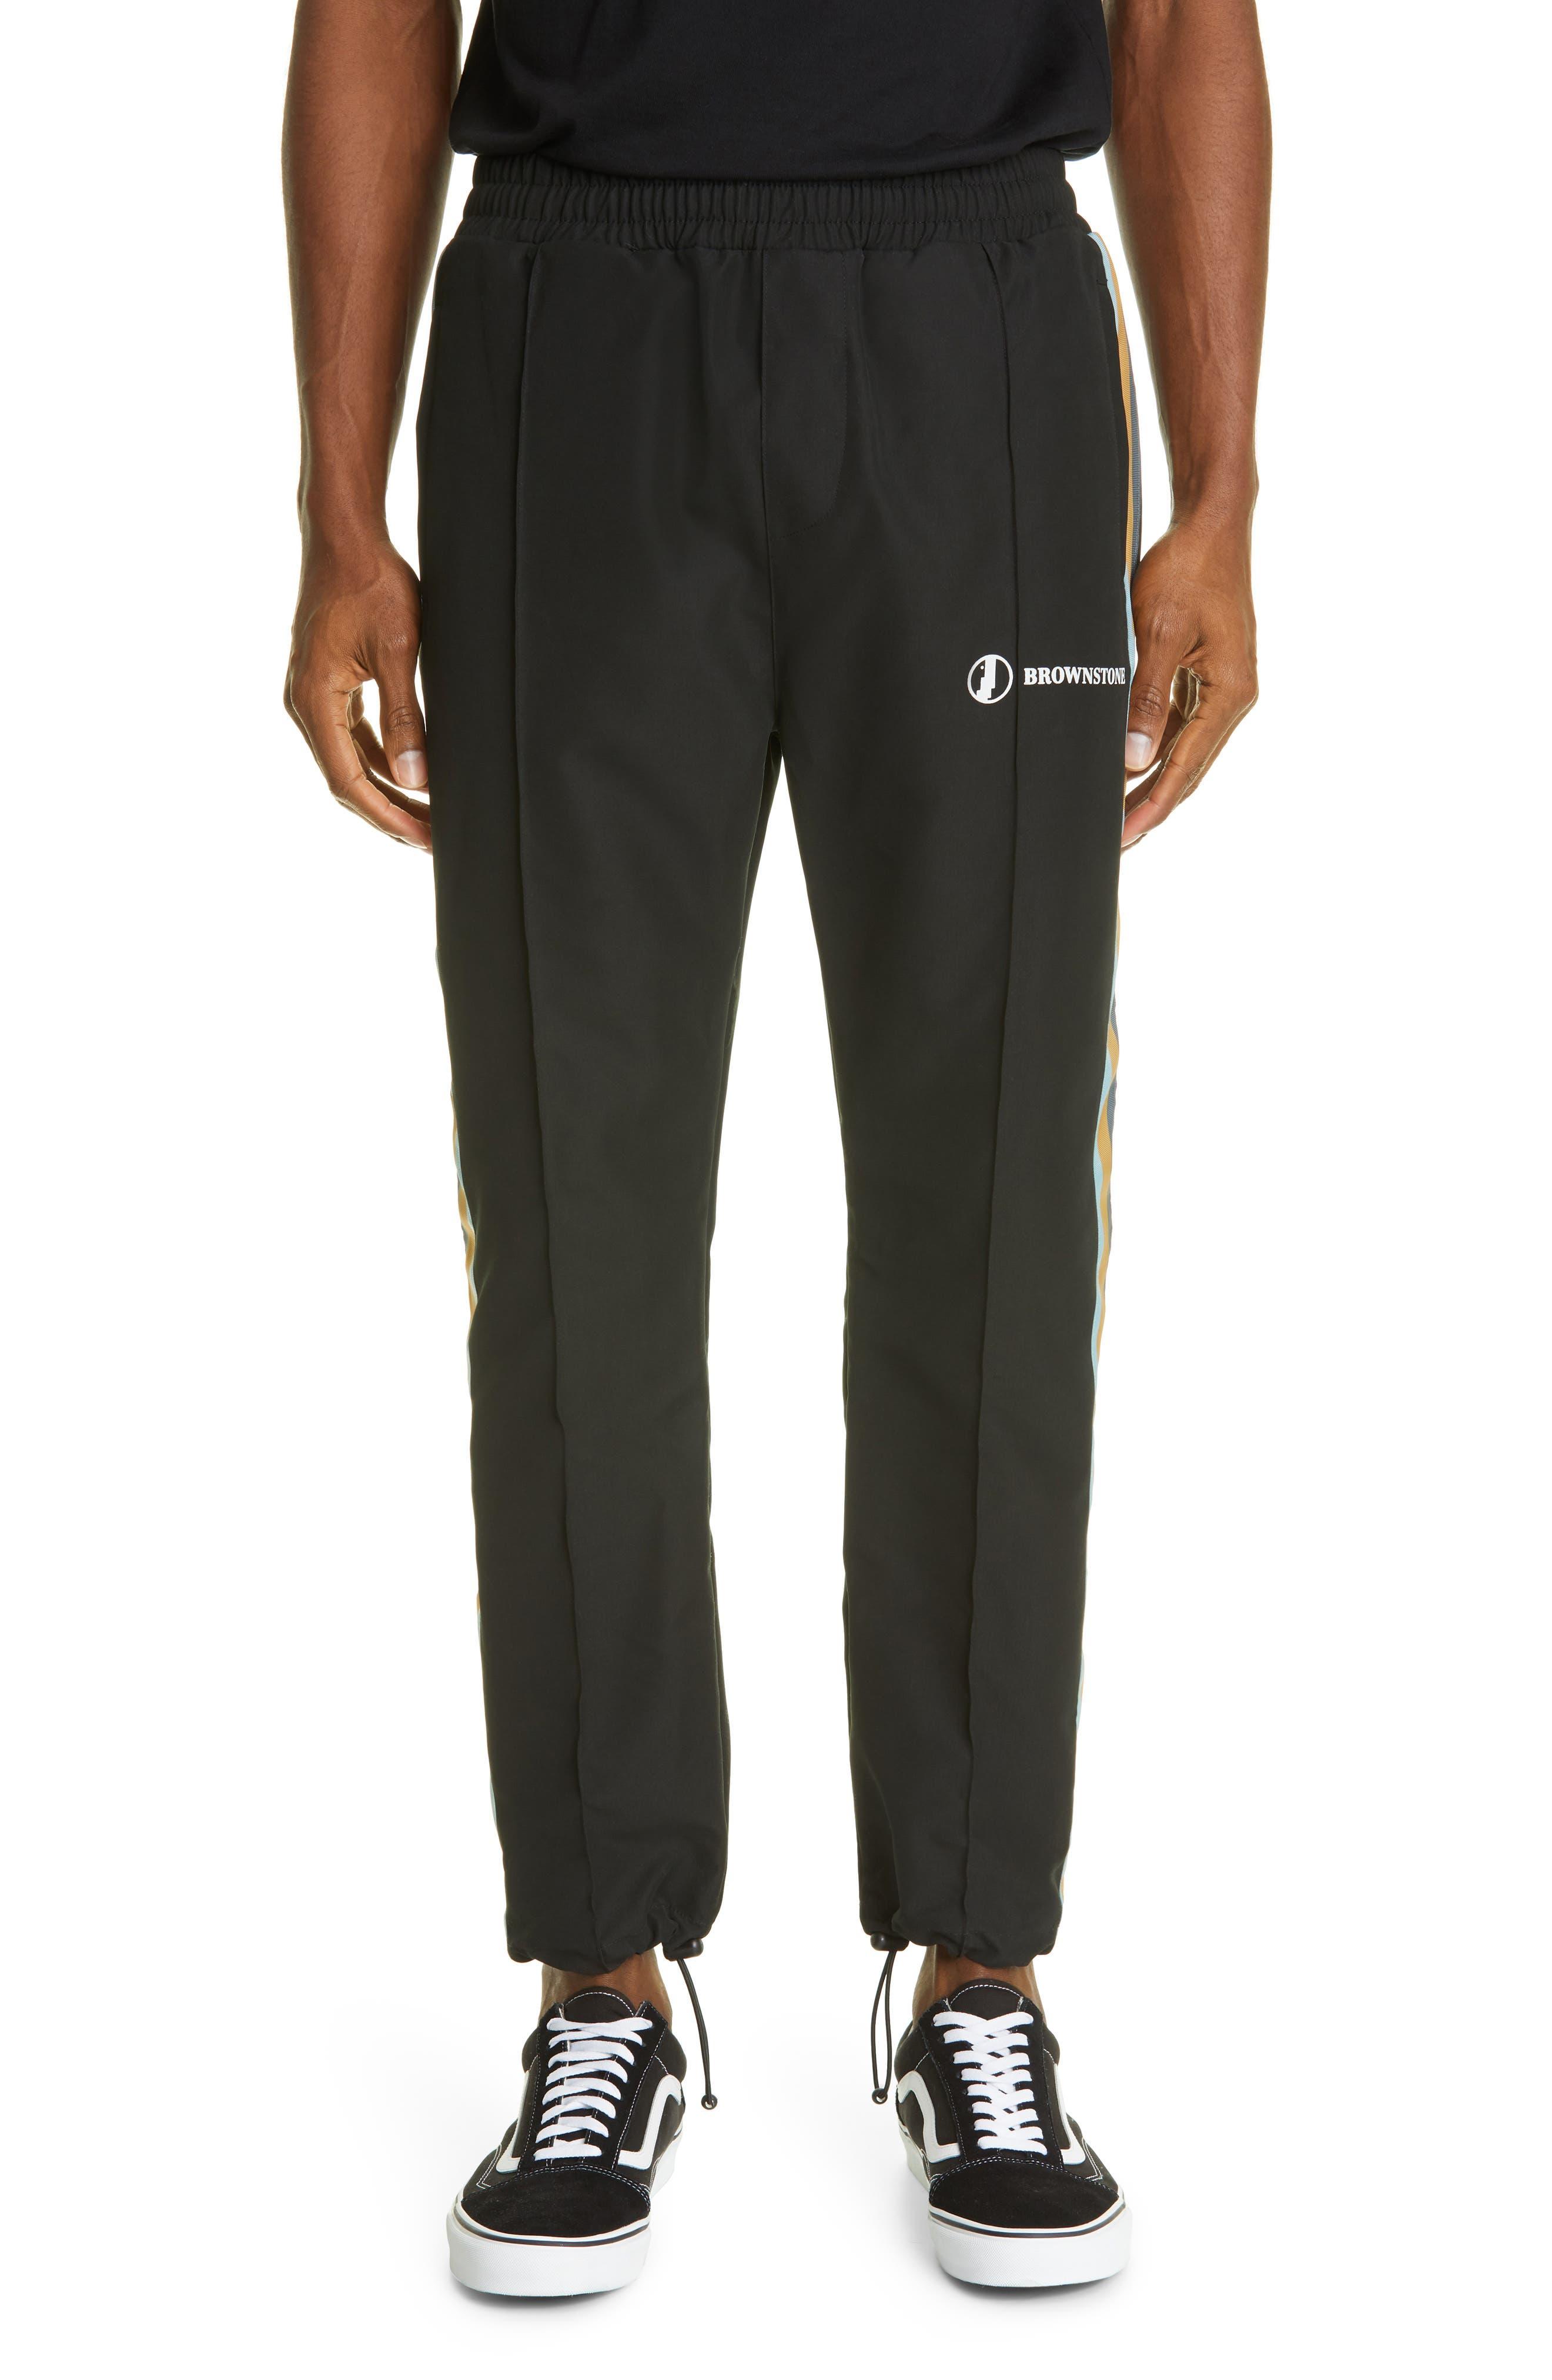 Brownstone Track Pants